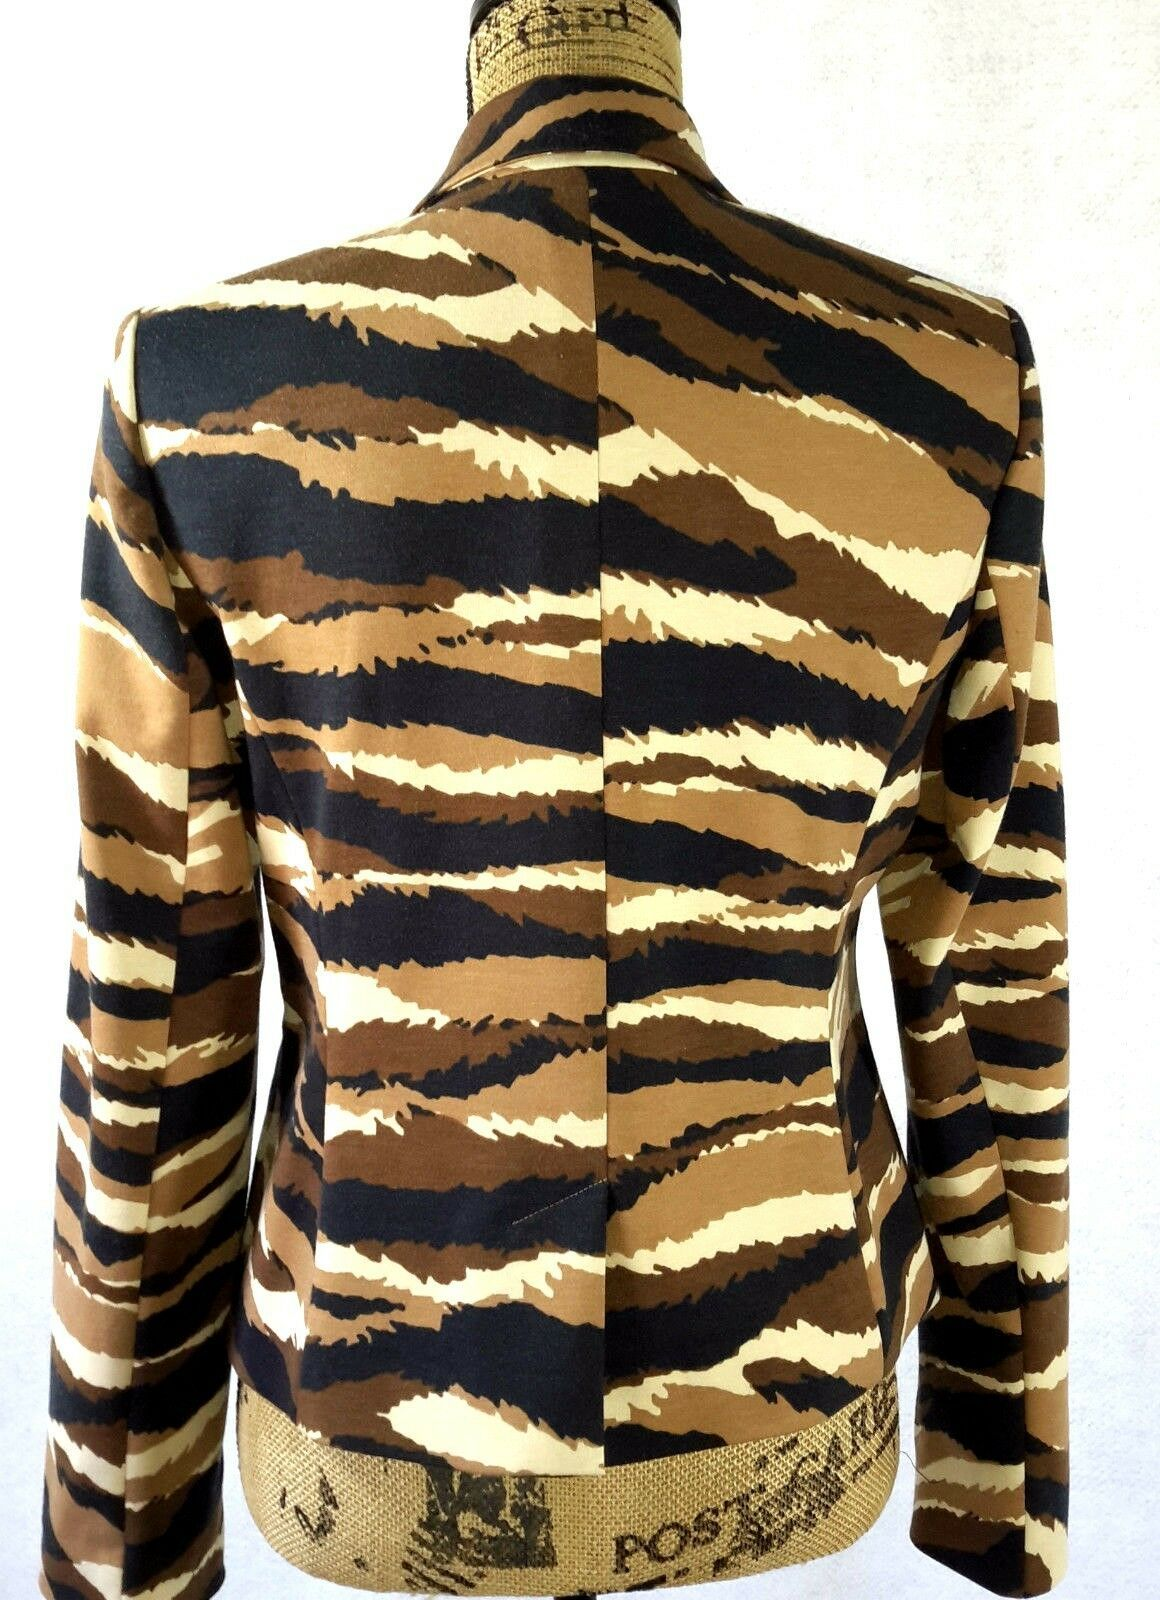 NEW Anne Klein M 6 Camel multi black brown ivory animal stripe blazer NWT $149